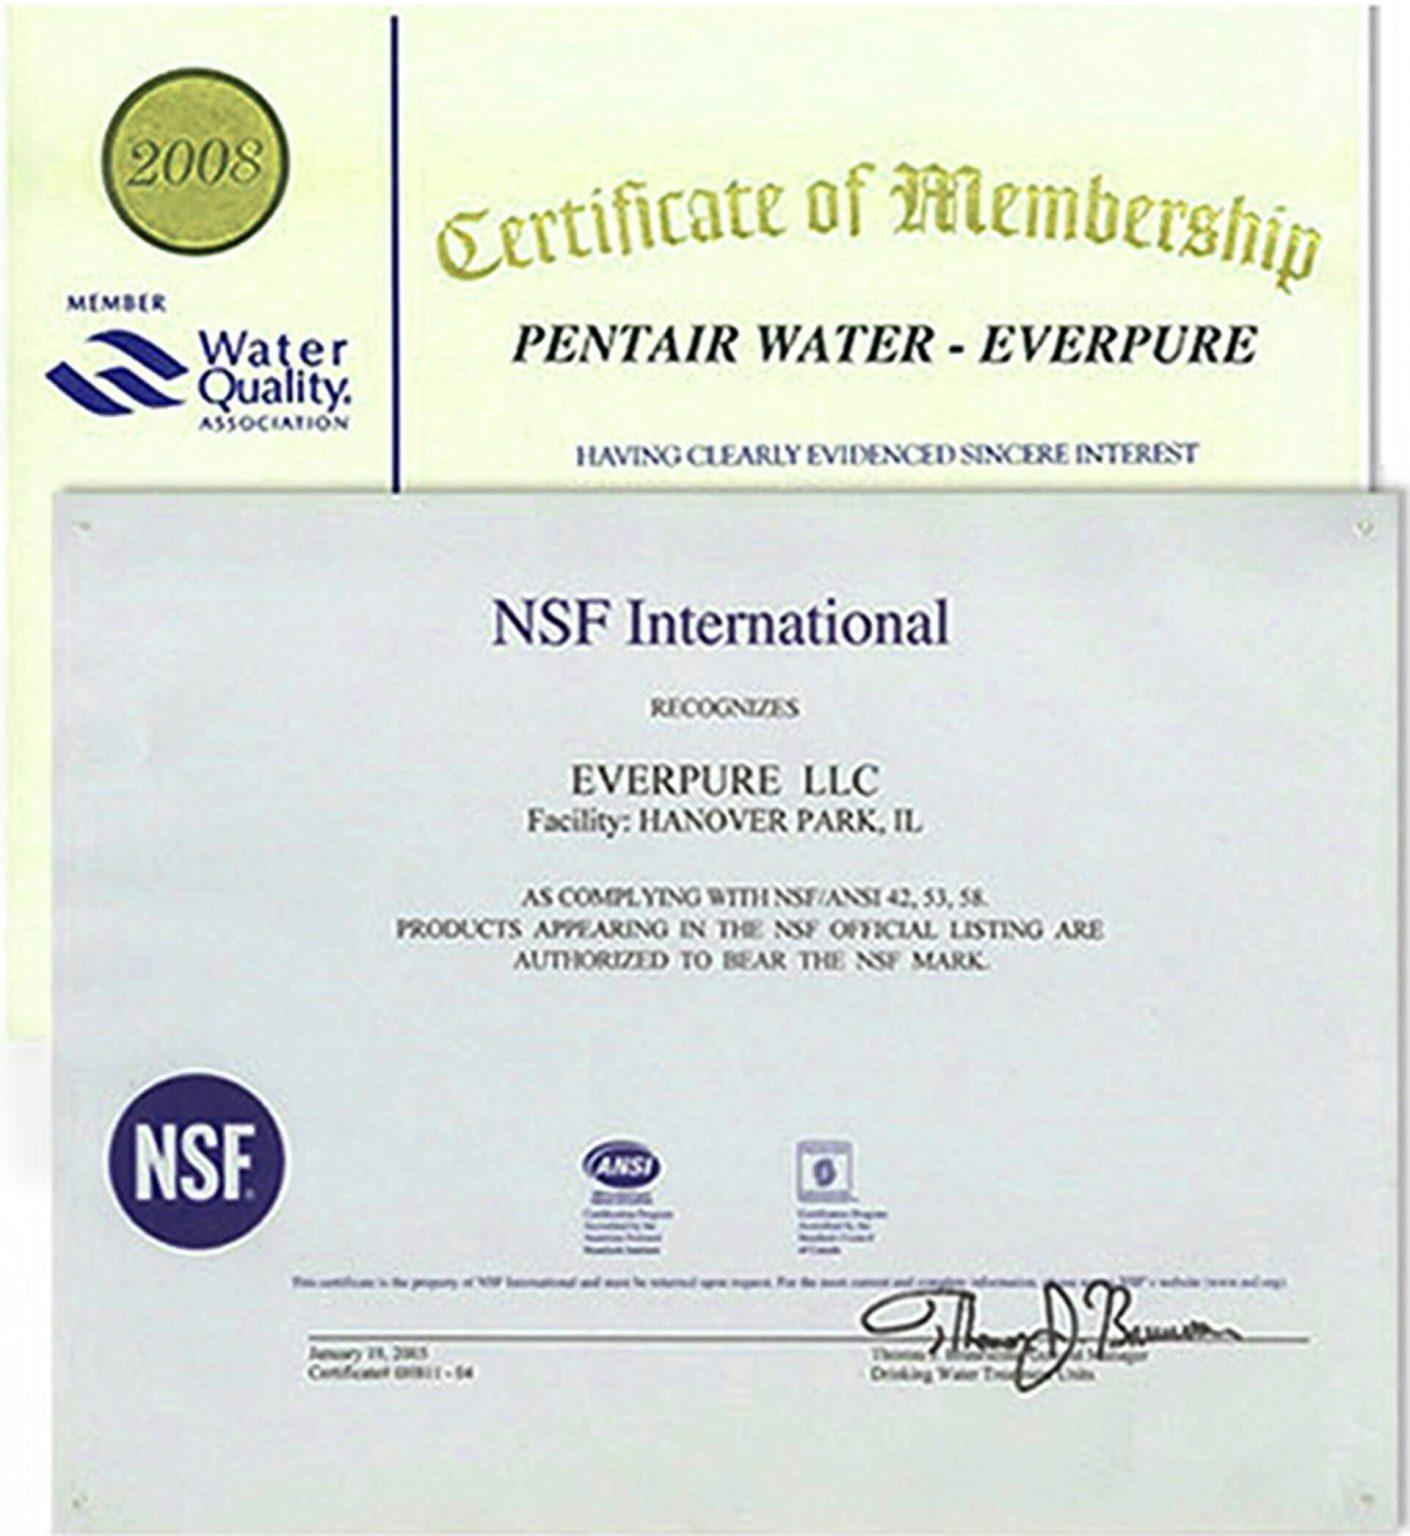 Máy lọc nước Pentair Everpure PBS-400 Standard - 4